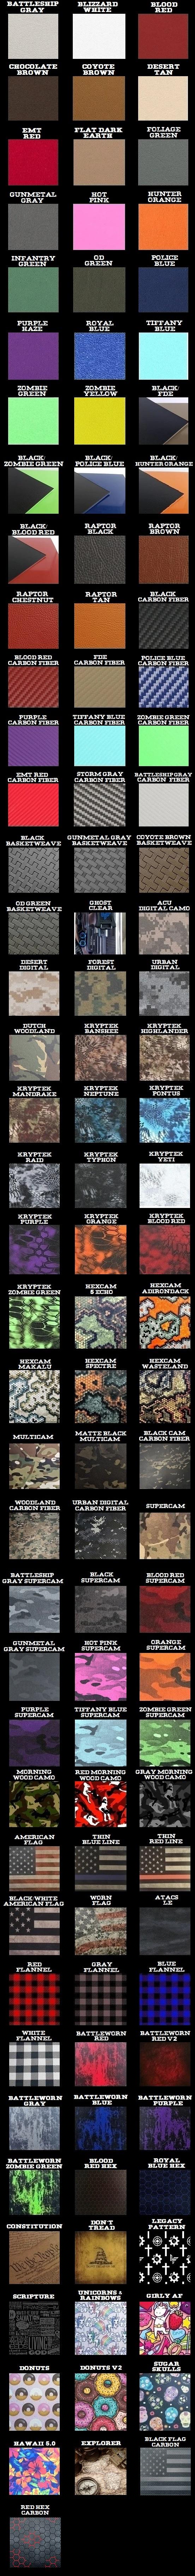 kydex-color-chart.jpg